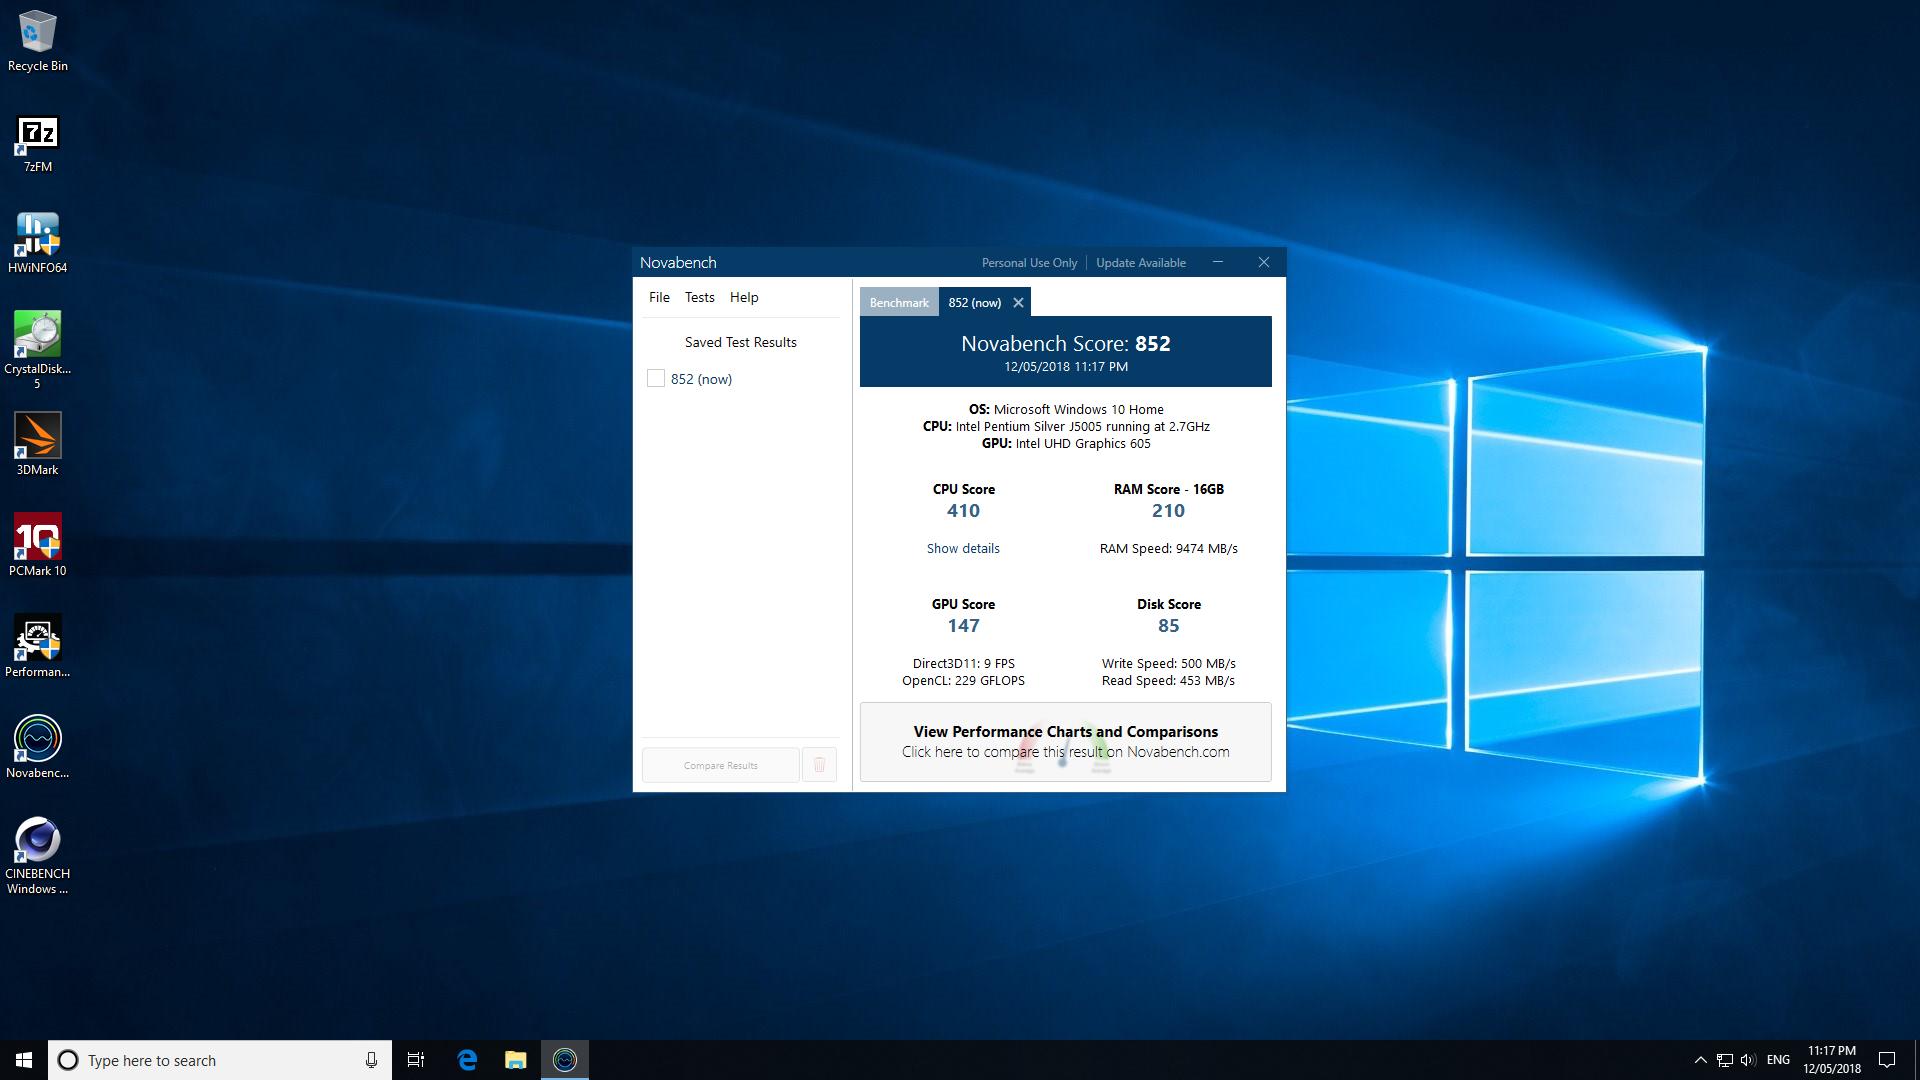 Intel NUC Kit NUC7PJYH Review - An Intel Gemini Lake Pentium